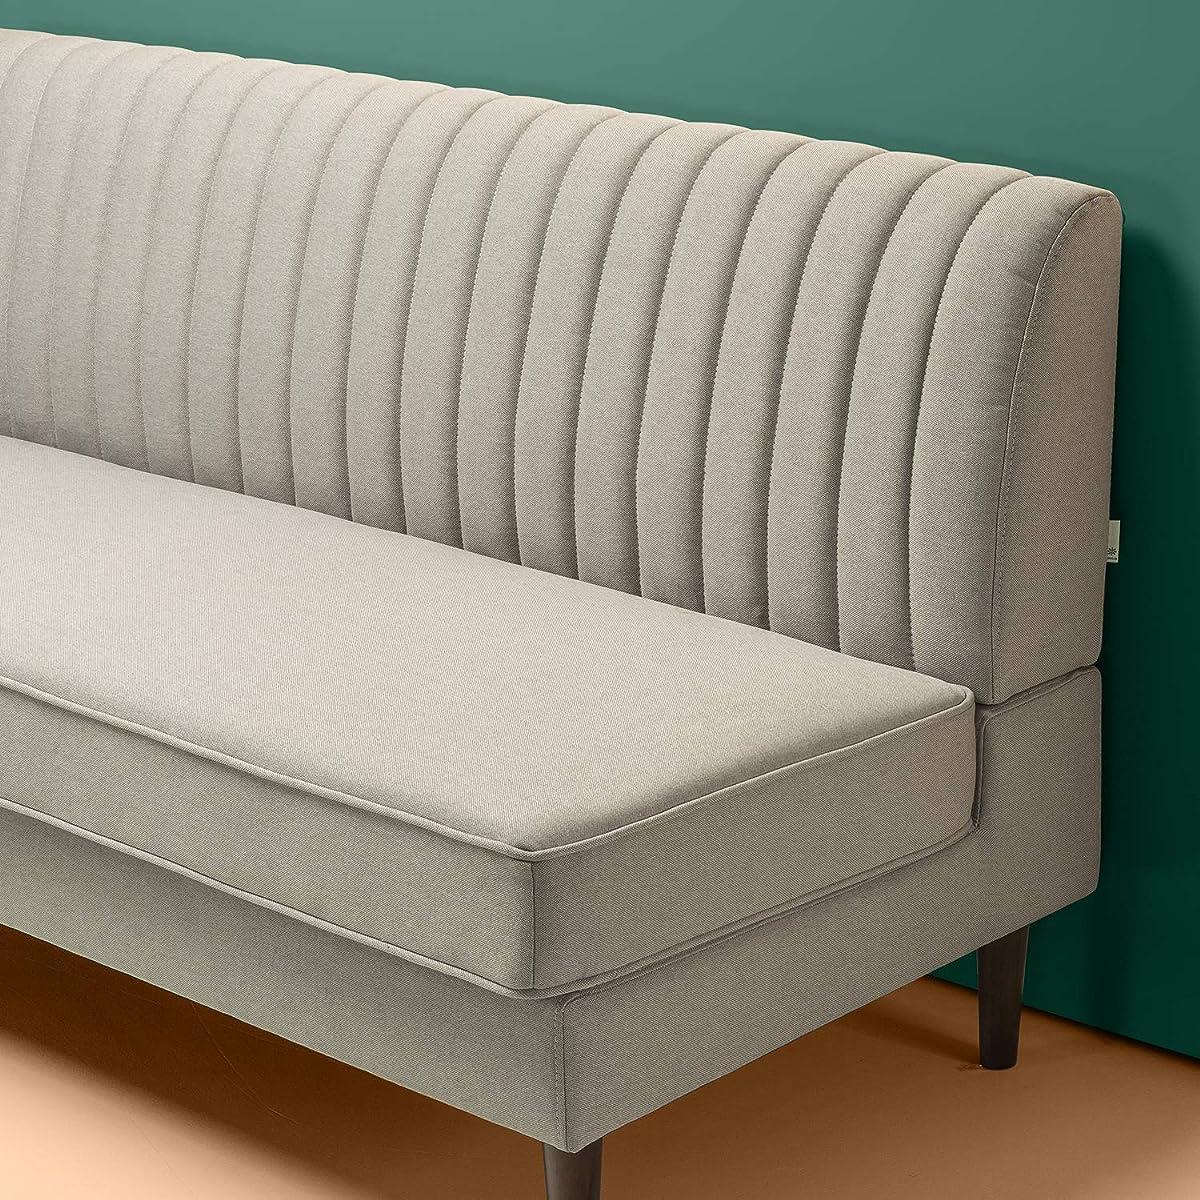 Zinus Jocelyn Contemporary 65 Inch Armless Sofa, Beige